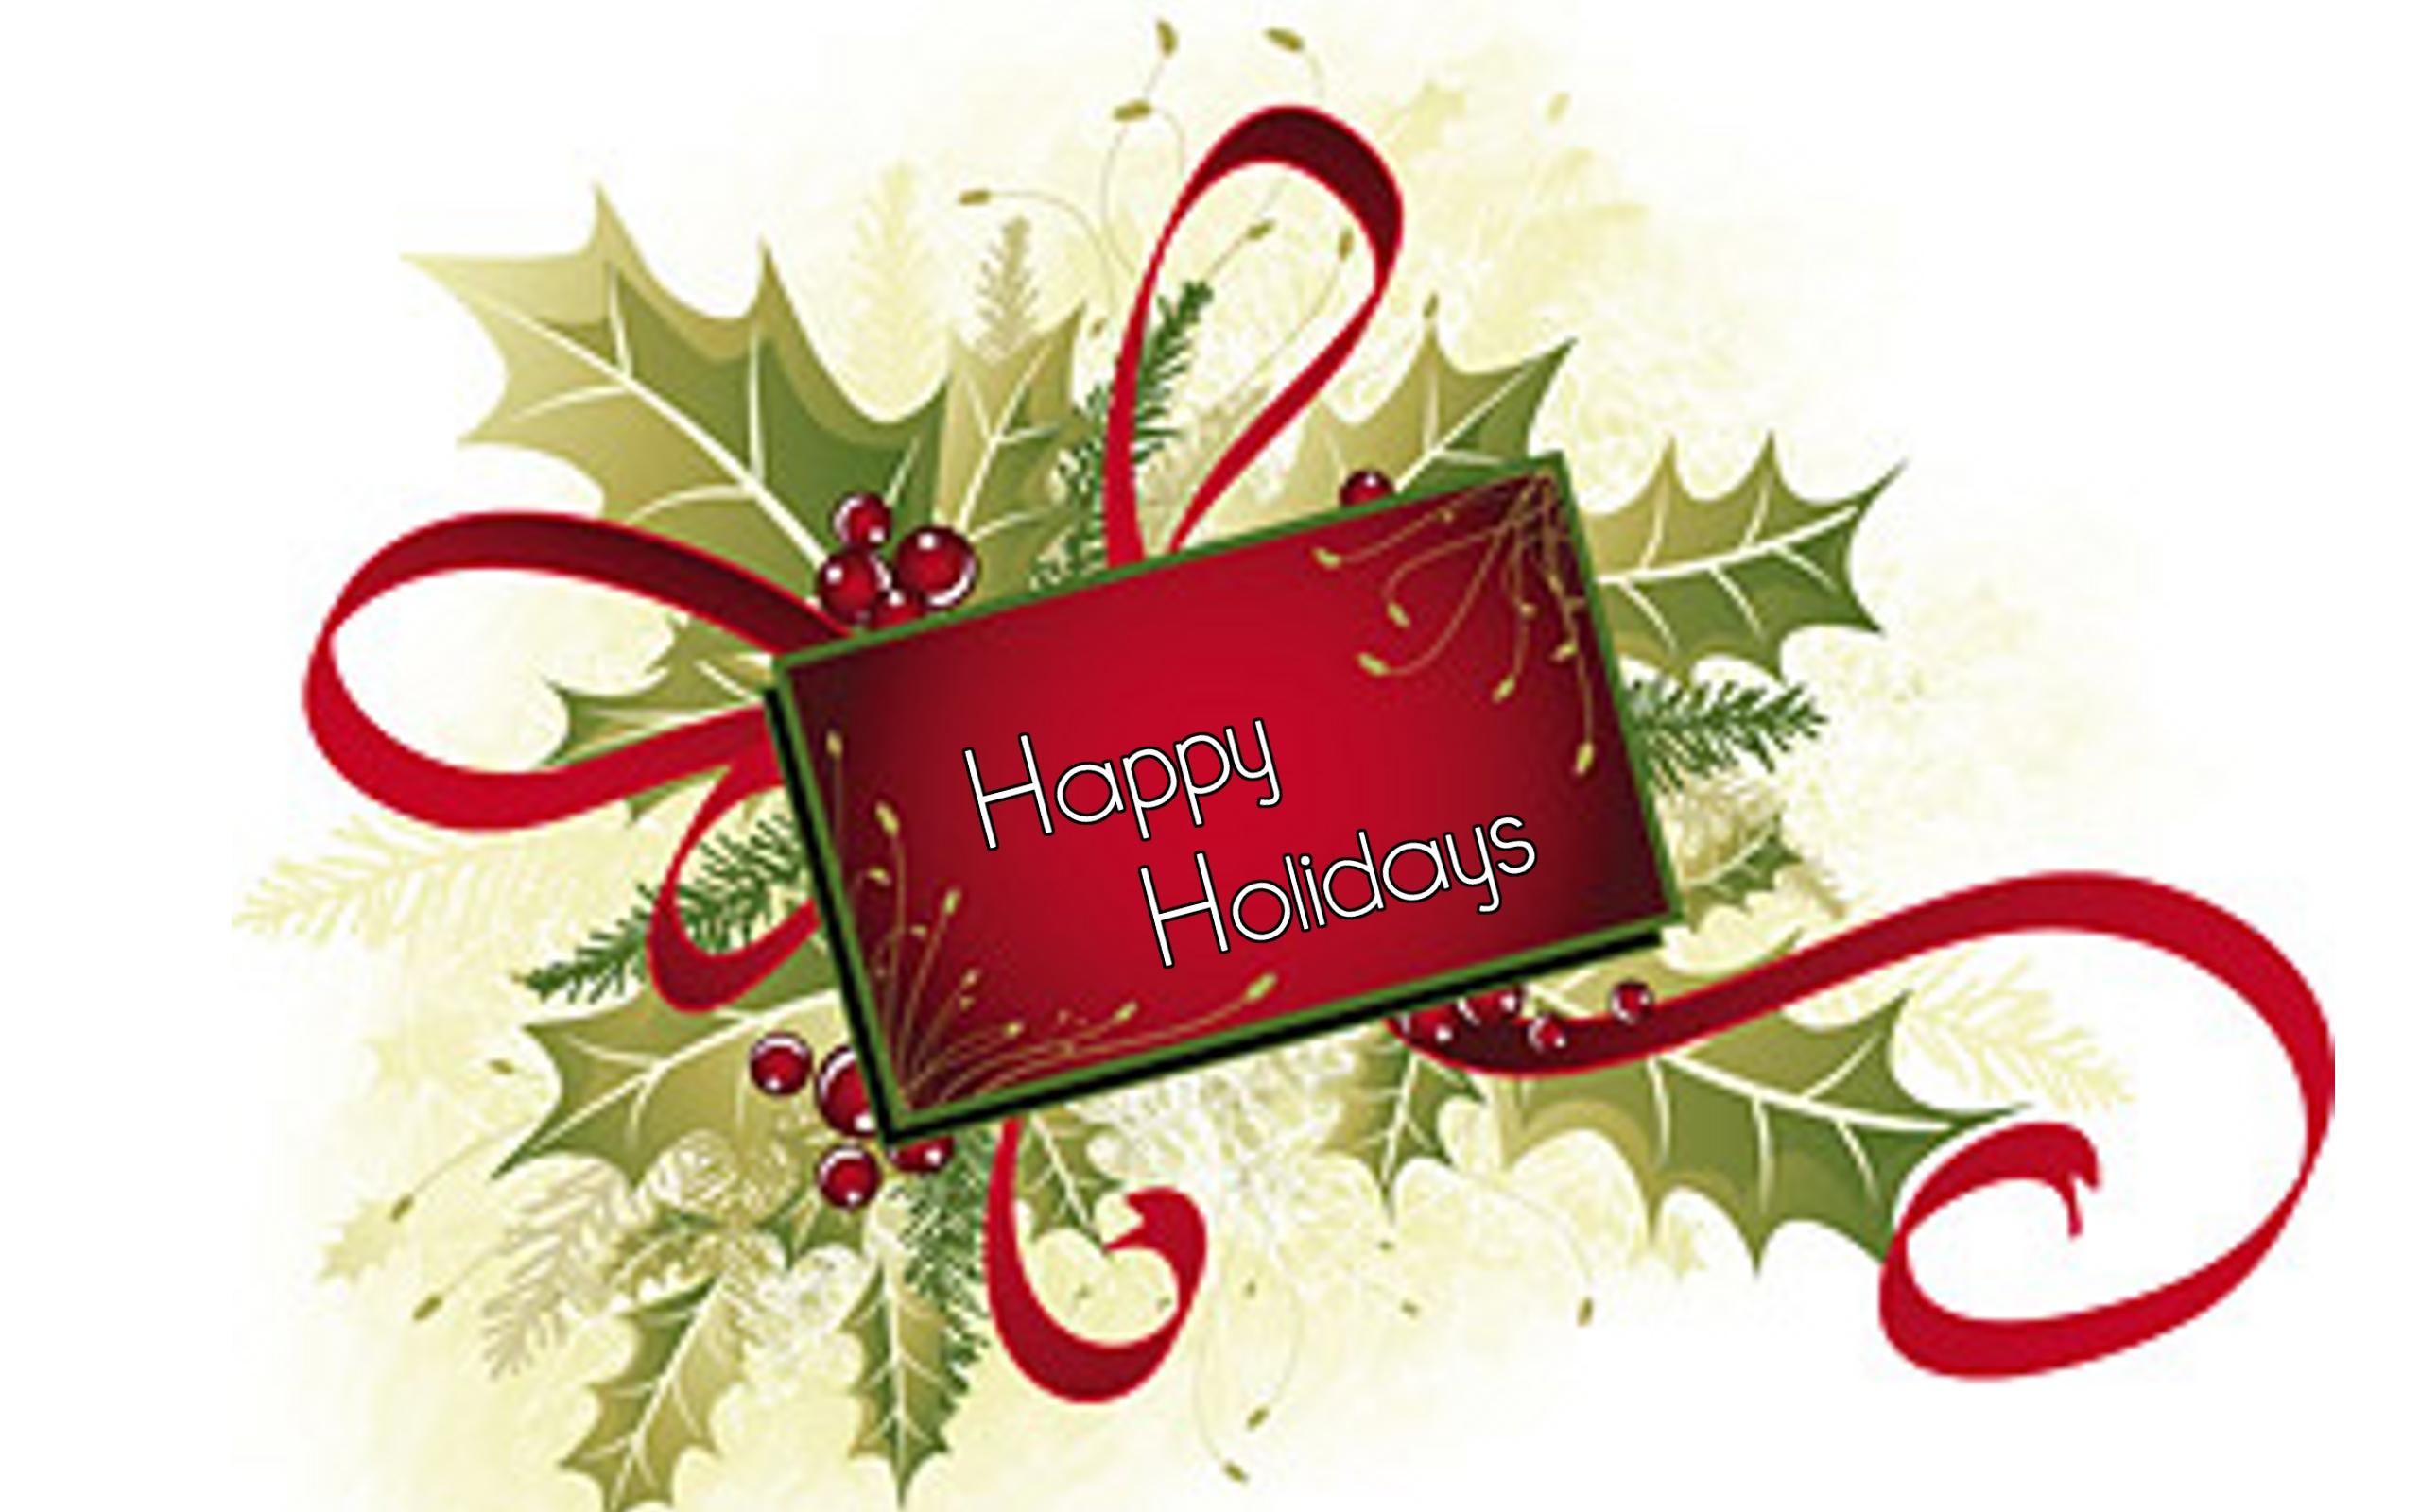 Happy holidays merry christmas and happy new year mybloggingdiary.